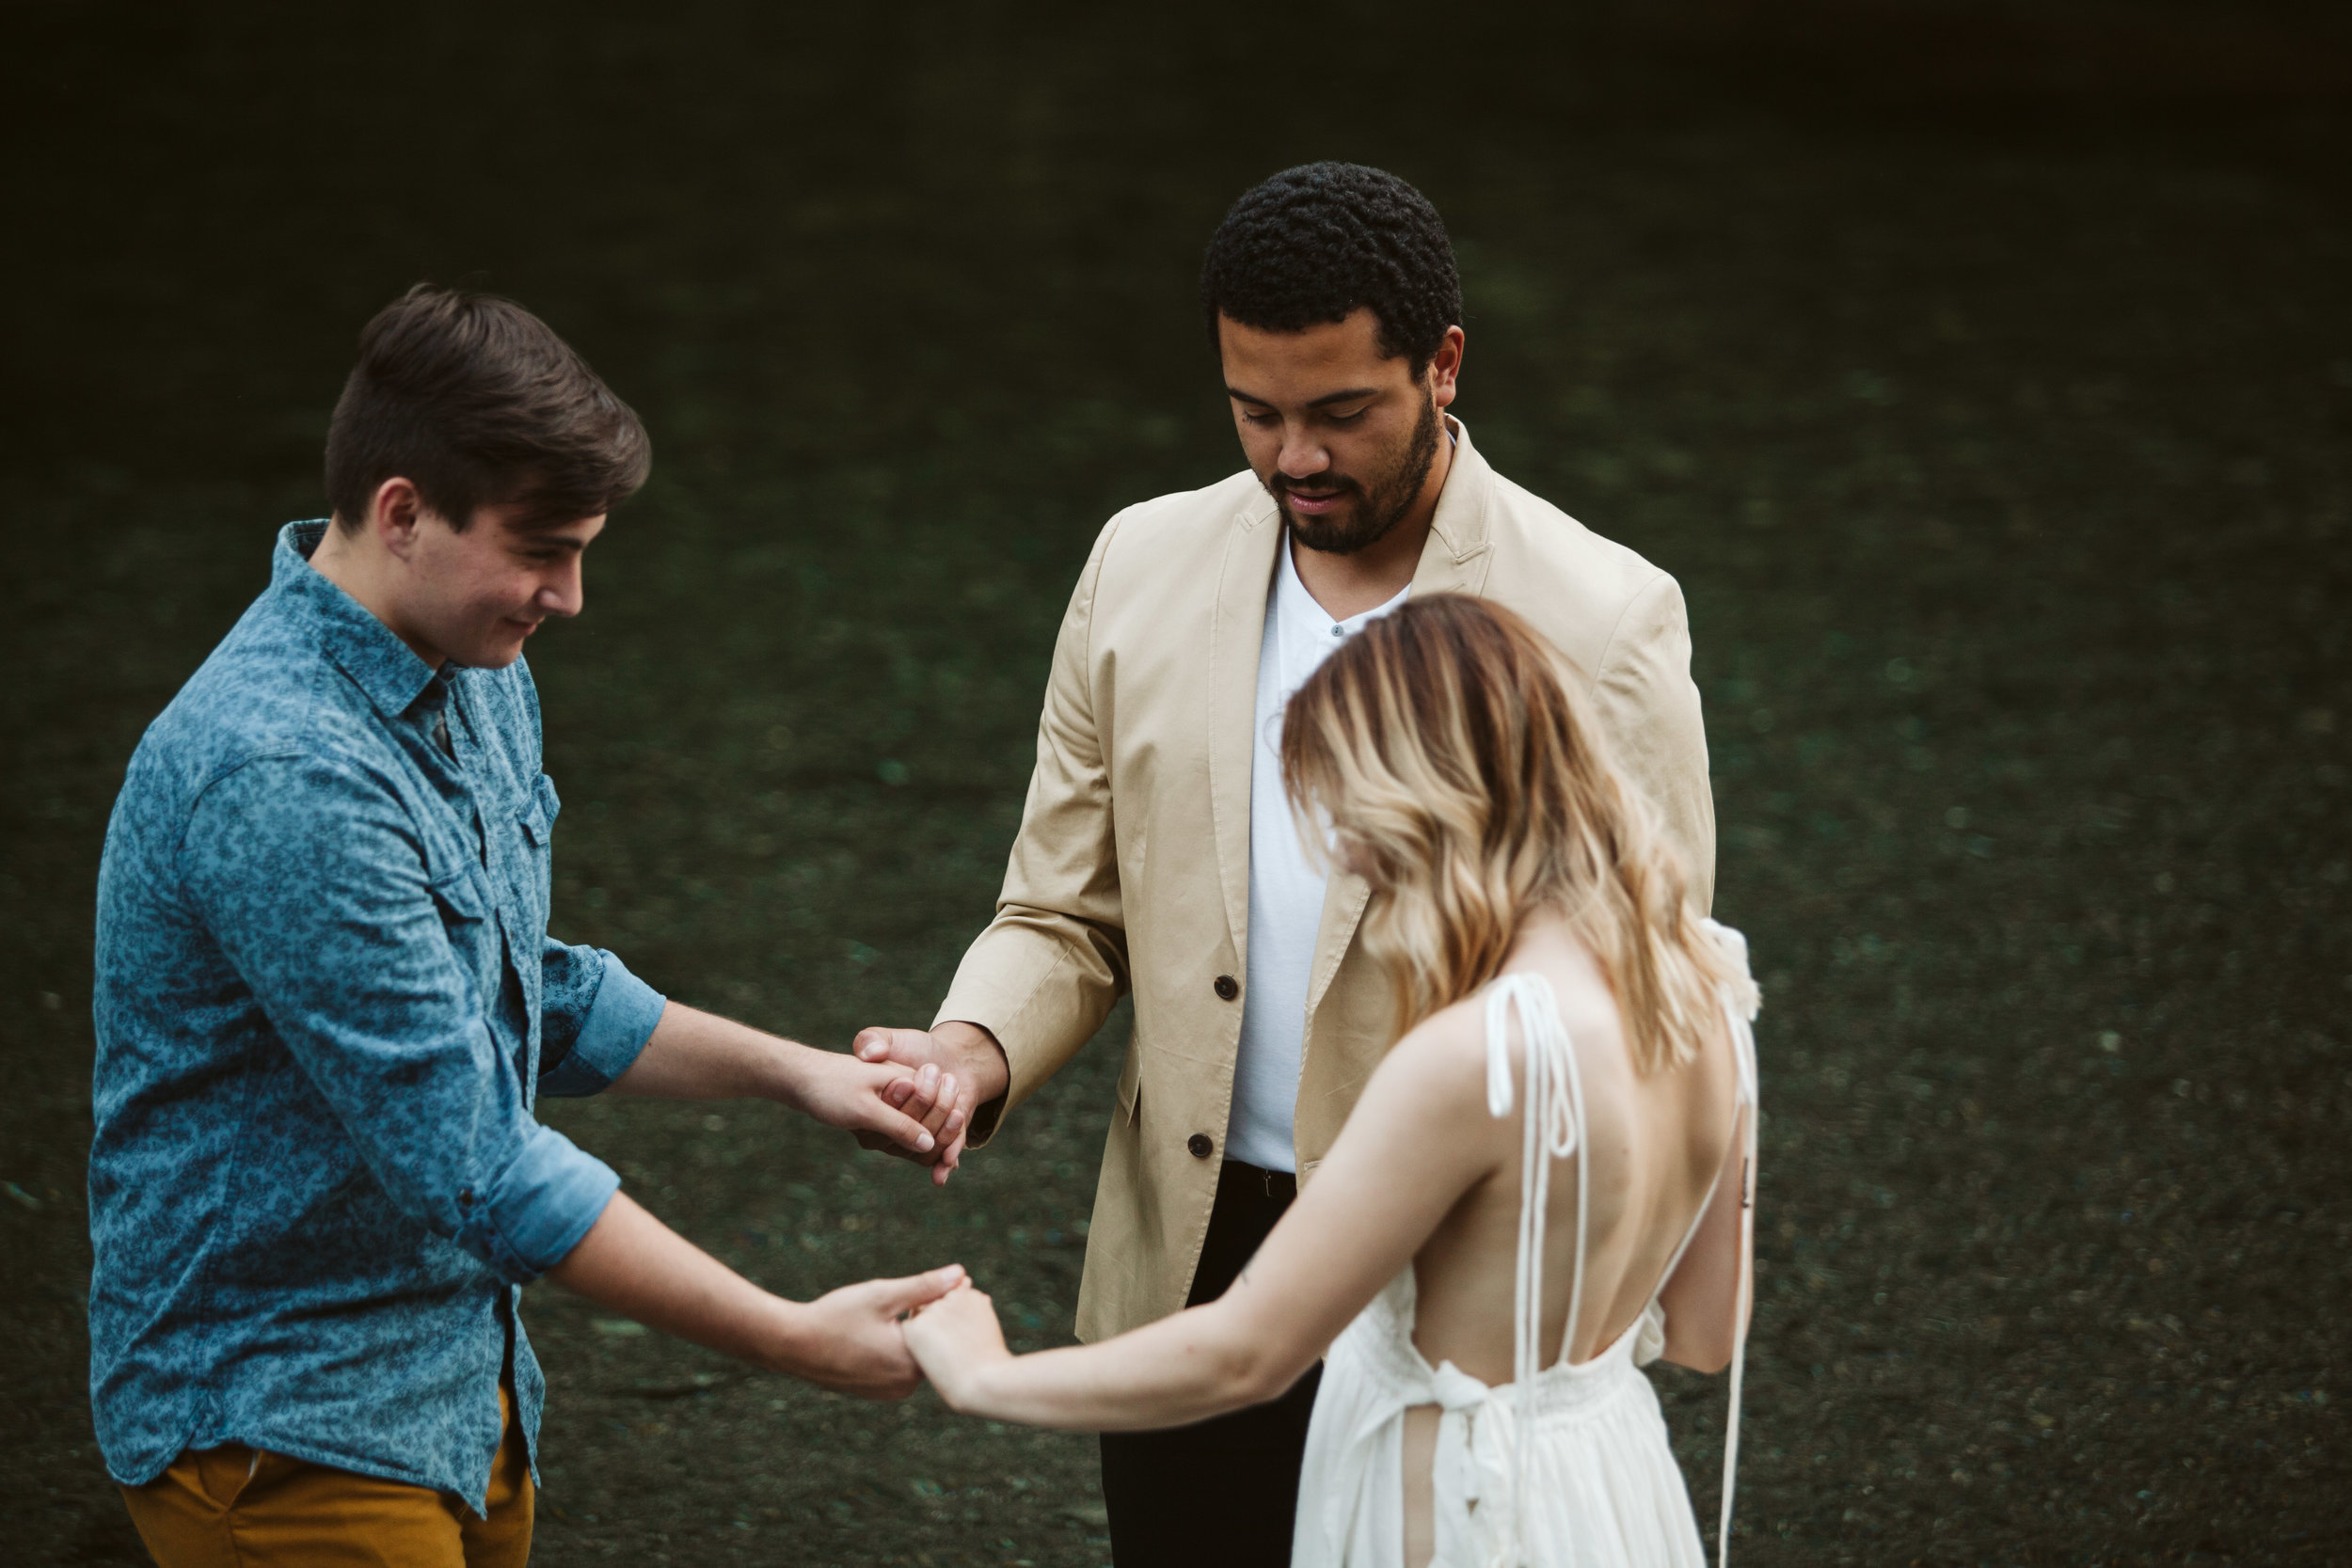 Hannah&Ben_Redwoods_Elopement_Engagement_PNW_SouthernOregon_NorthernCalifornia_ (22 of 23).jpg